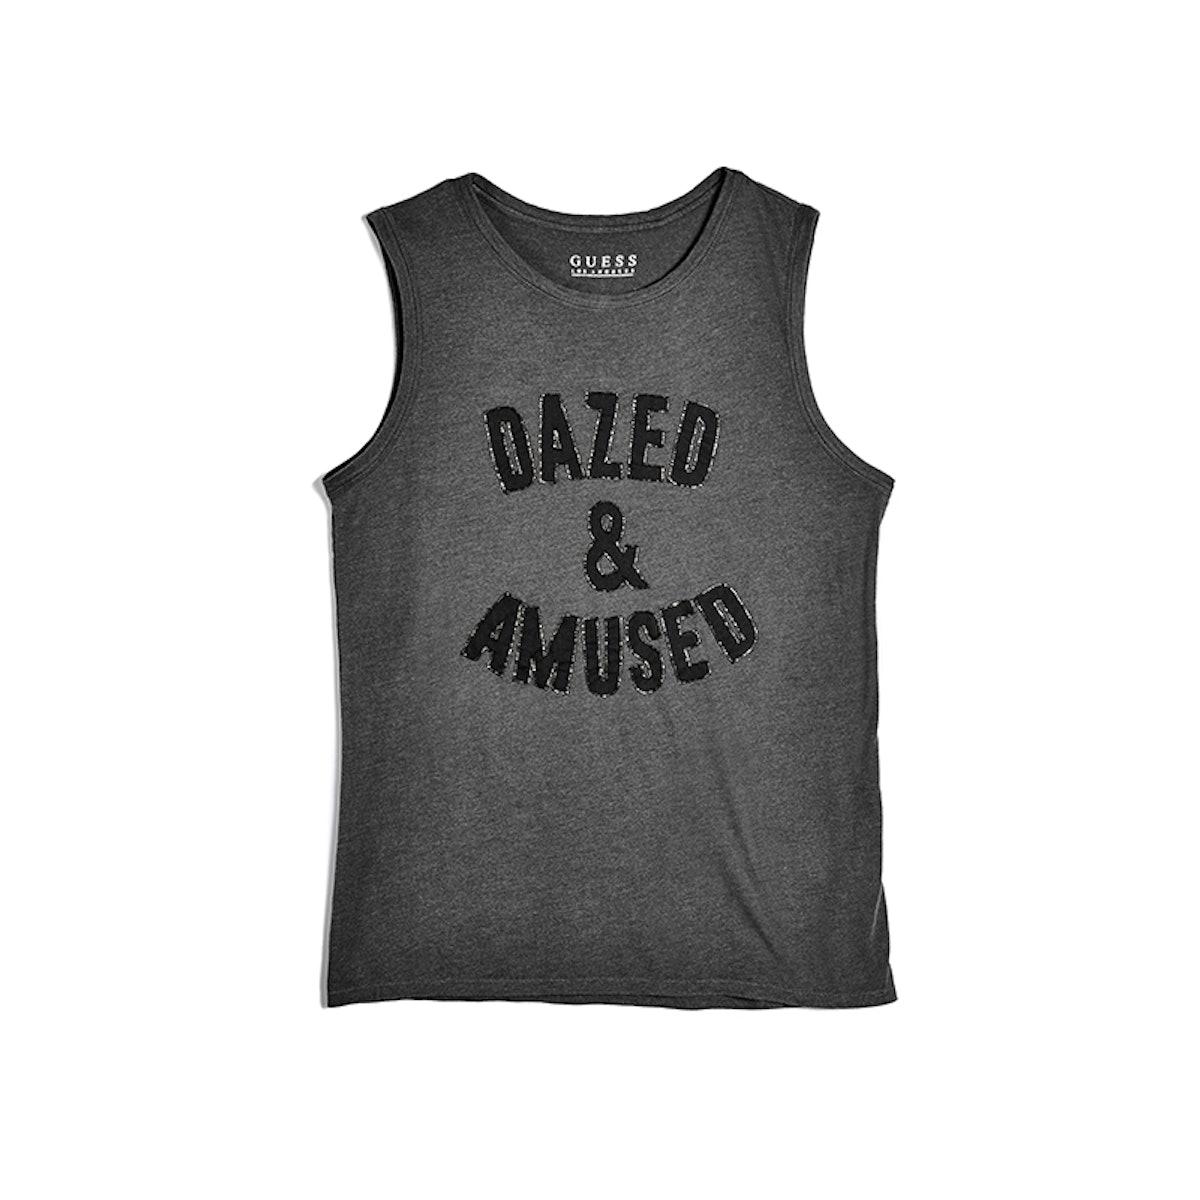 Dazed Tank